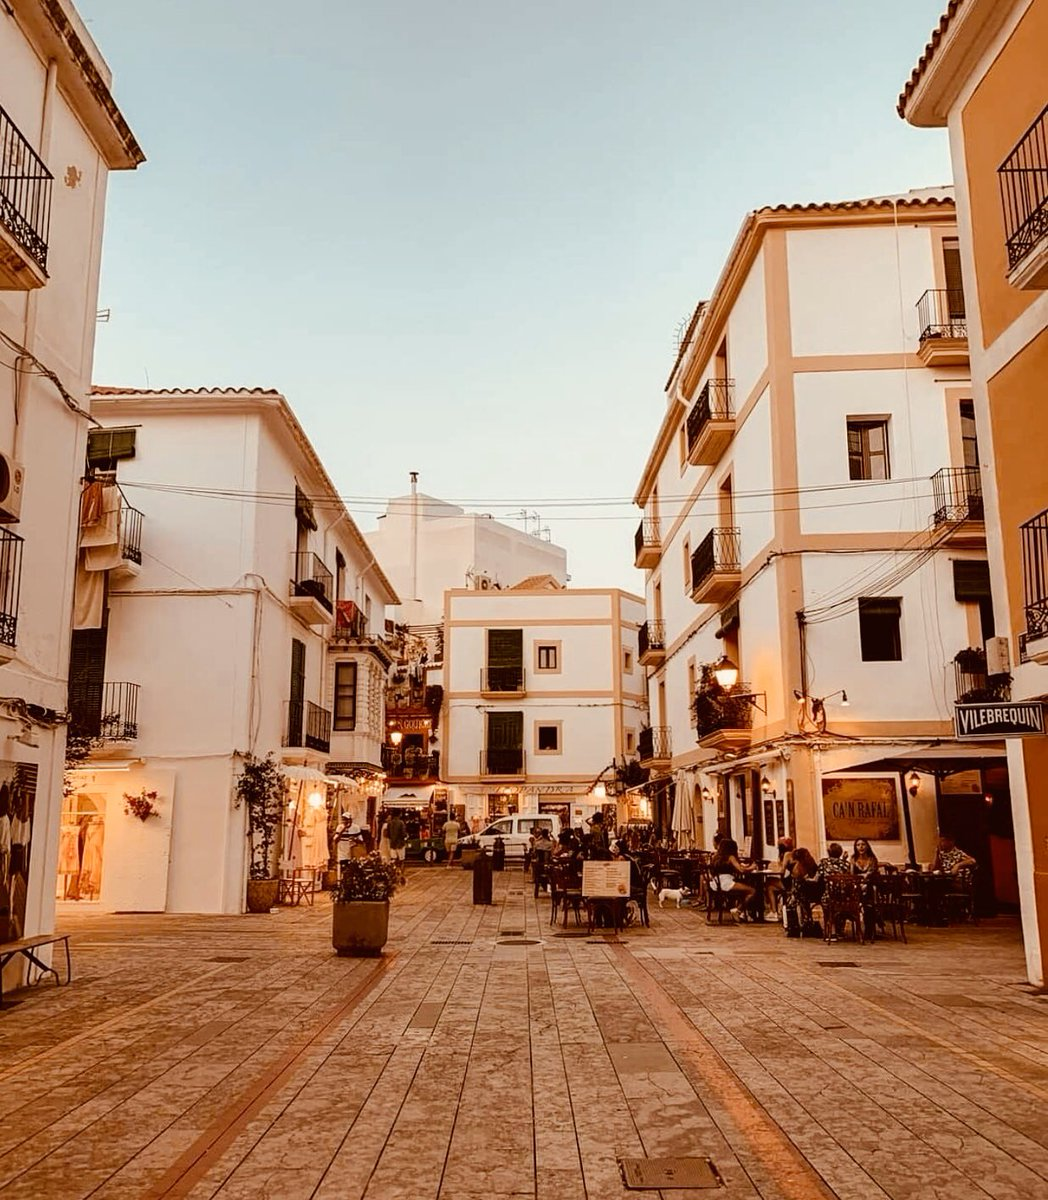 If these streets could talk it would sound like poetry ✨✨  Photo Credit: @maurimix #ibiza #ibiza2020 #ibizanights #ibizalife #ibizalifestyle #ibizalights #ibizastreets #balearicislands #balearicsvibes #balearicnights #ibizatown #ibizaoldtown #ibizacenter https://t.co/aZjXfDfbBl